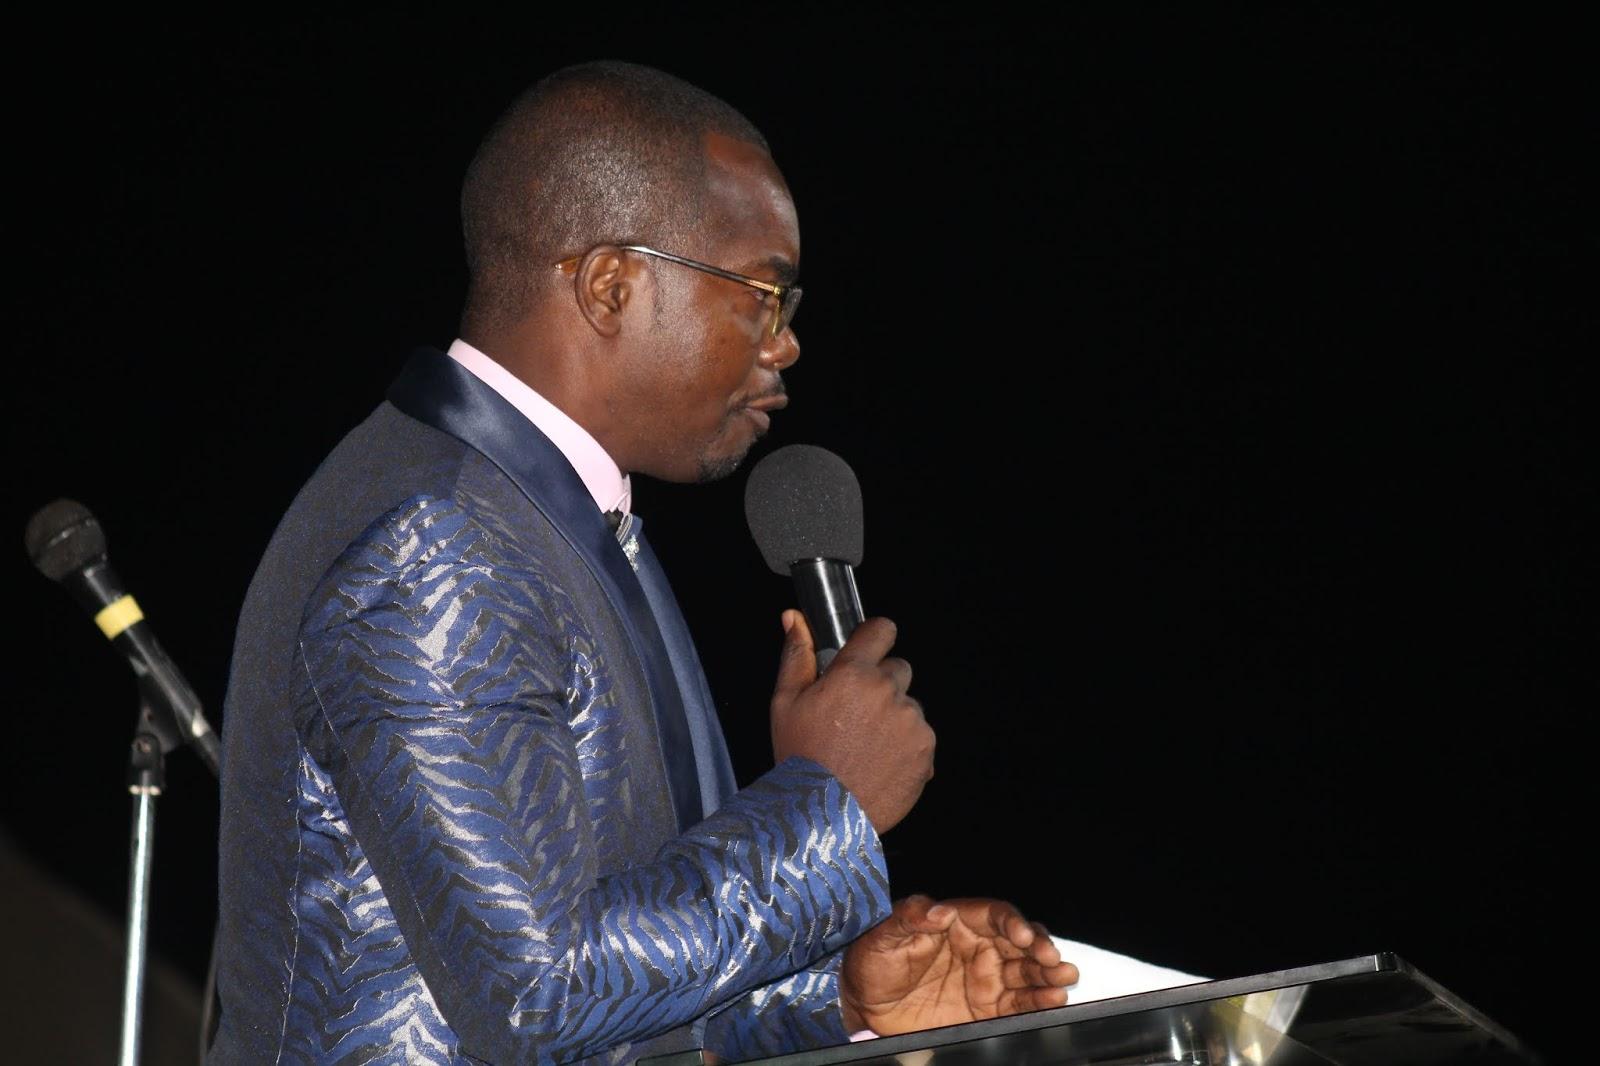 Apostle Shiloh Masenyama Preaches At Tiyambuke Wednesday Night 2018